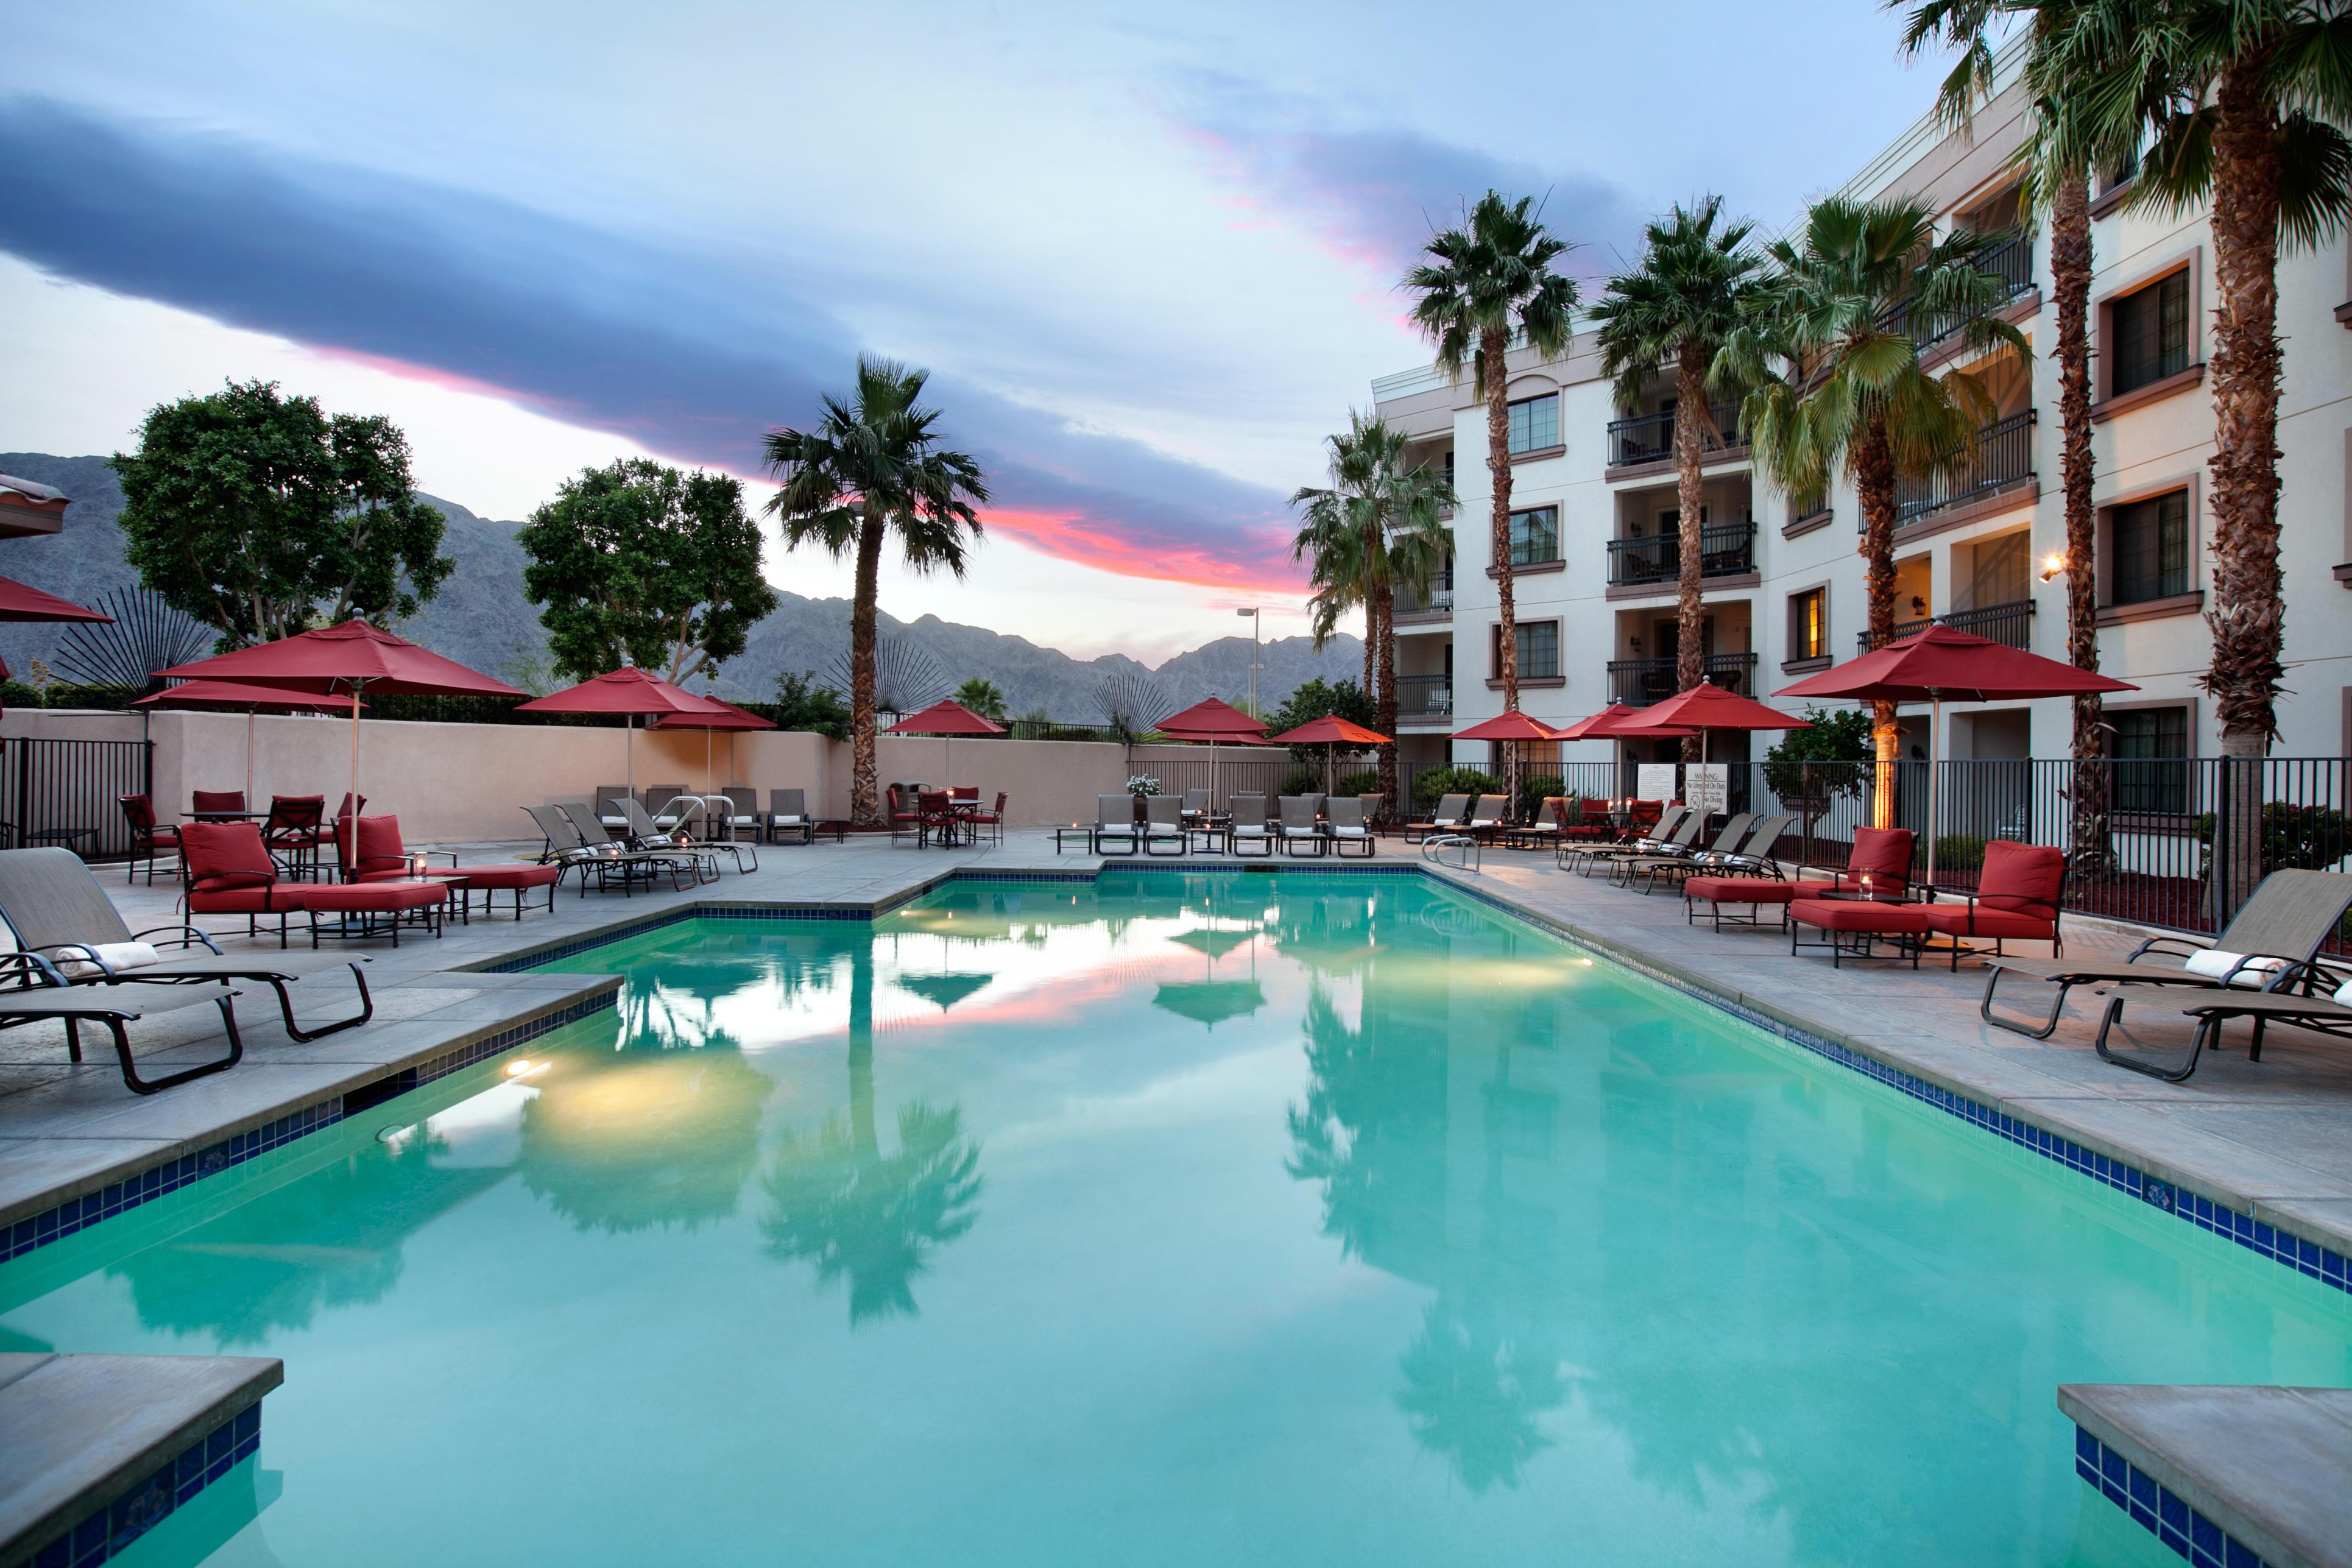 Embassy Suites La Quinta Spa And Resort